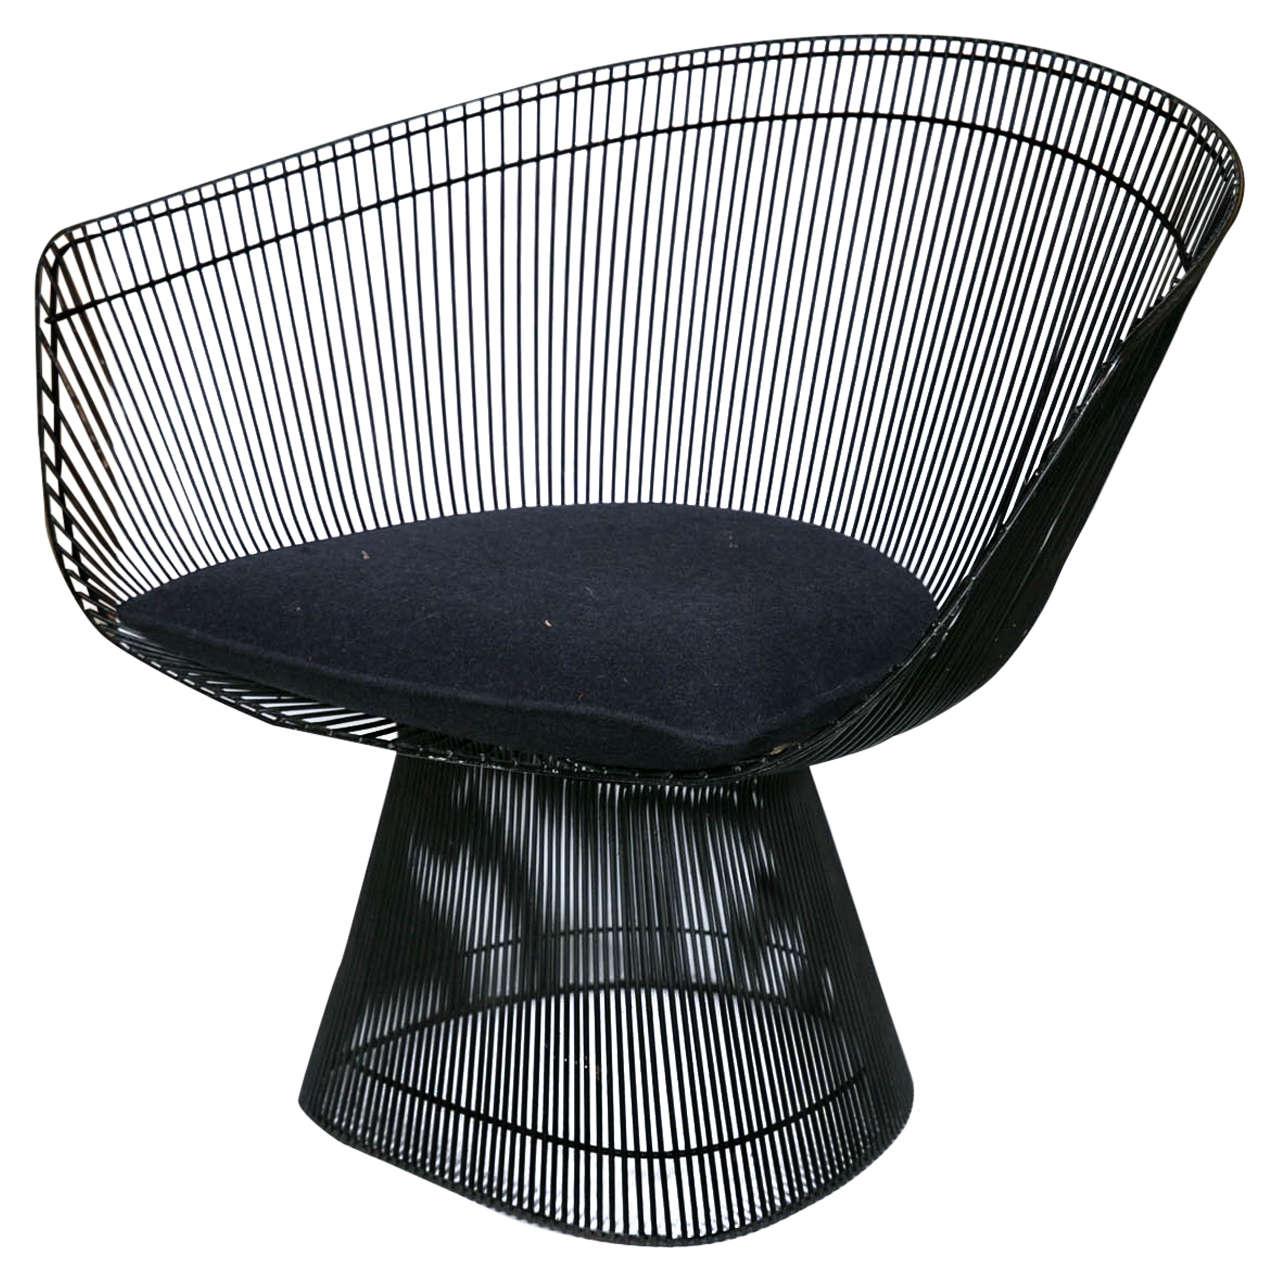 Midcentury Warren Platner Lounge Chair For Knoll At 1stdibs